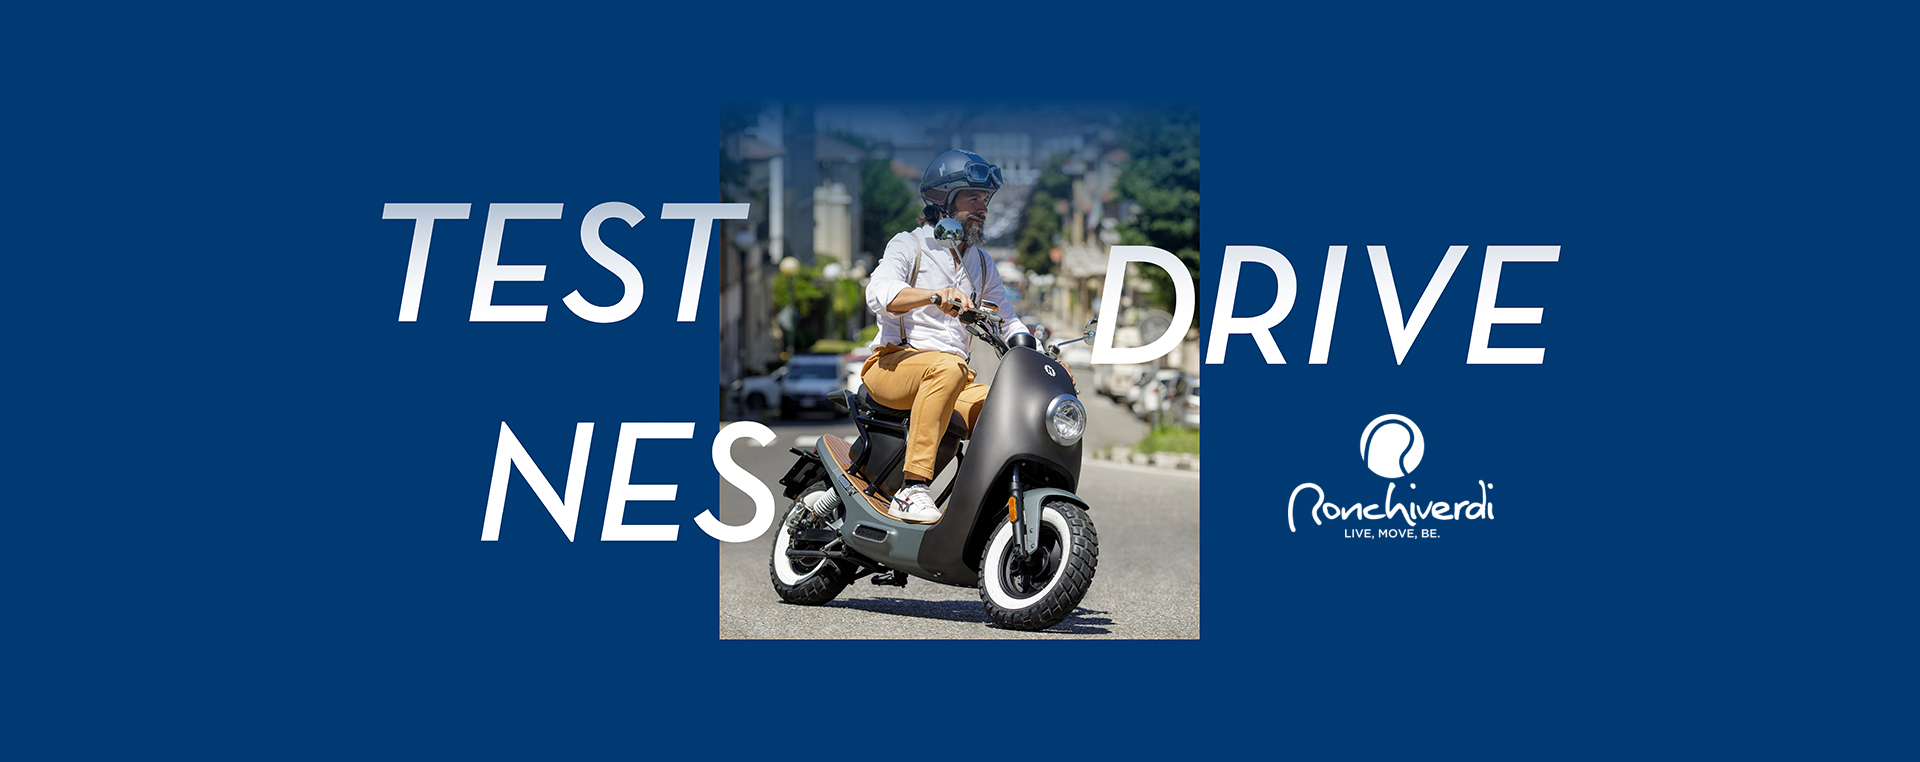 test drive ronchi seconda pagina news (004)